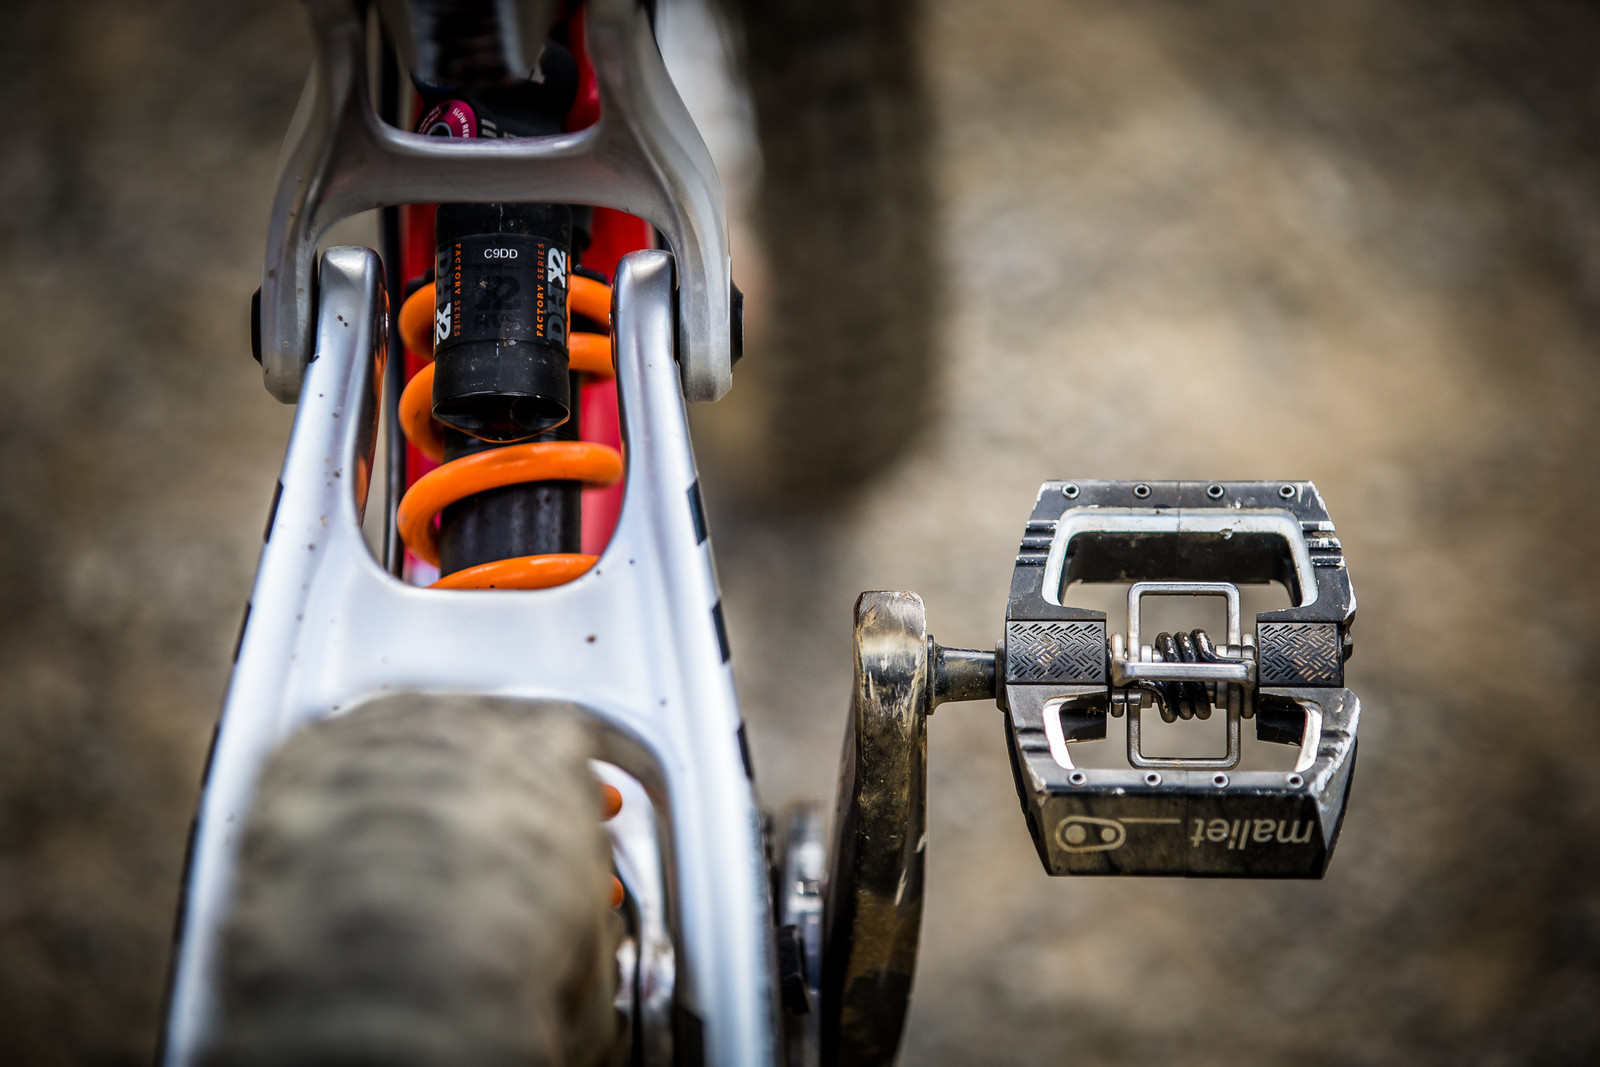 Crankbrothers Mallet DH Pedals - WINNING BIKE: Greg Minnaar's Santa Cruz V10 29er - Mountain Biking Pictures - Vital MTB